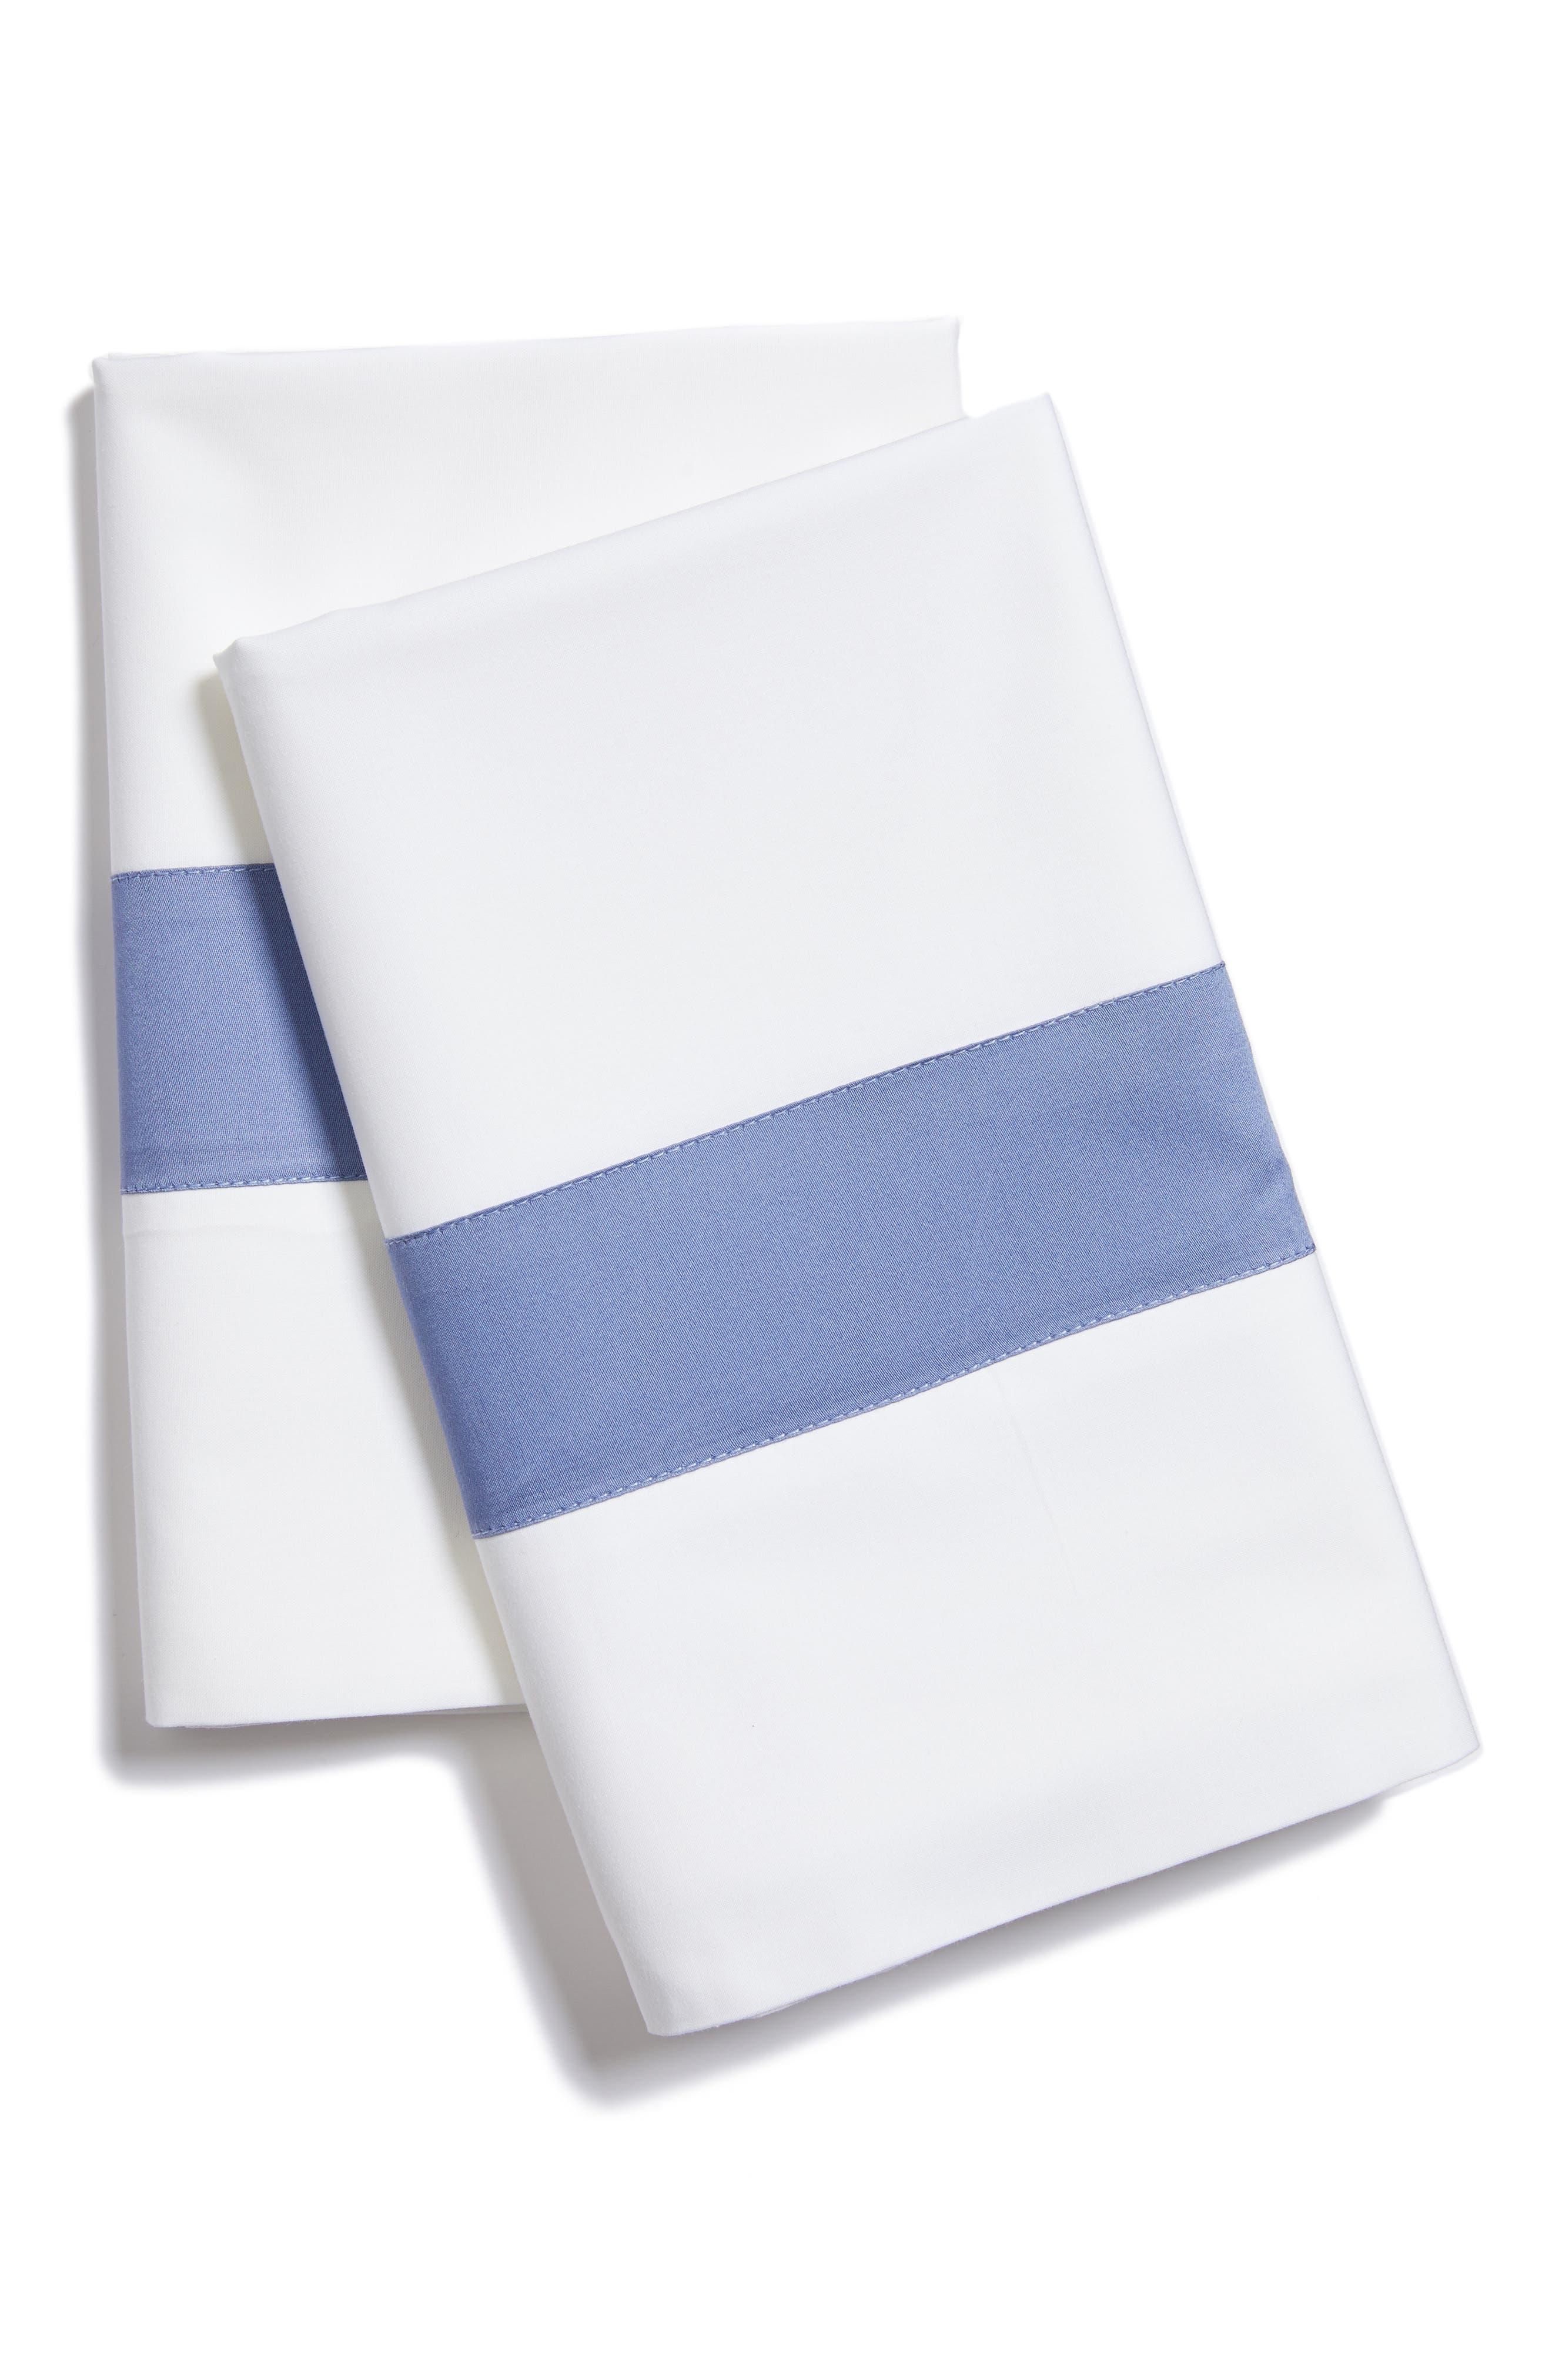 Orlo Pillowcase,                             Main thumbnail 1, color,                             White/ Cornflower